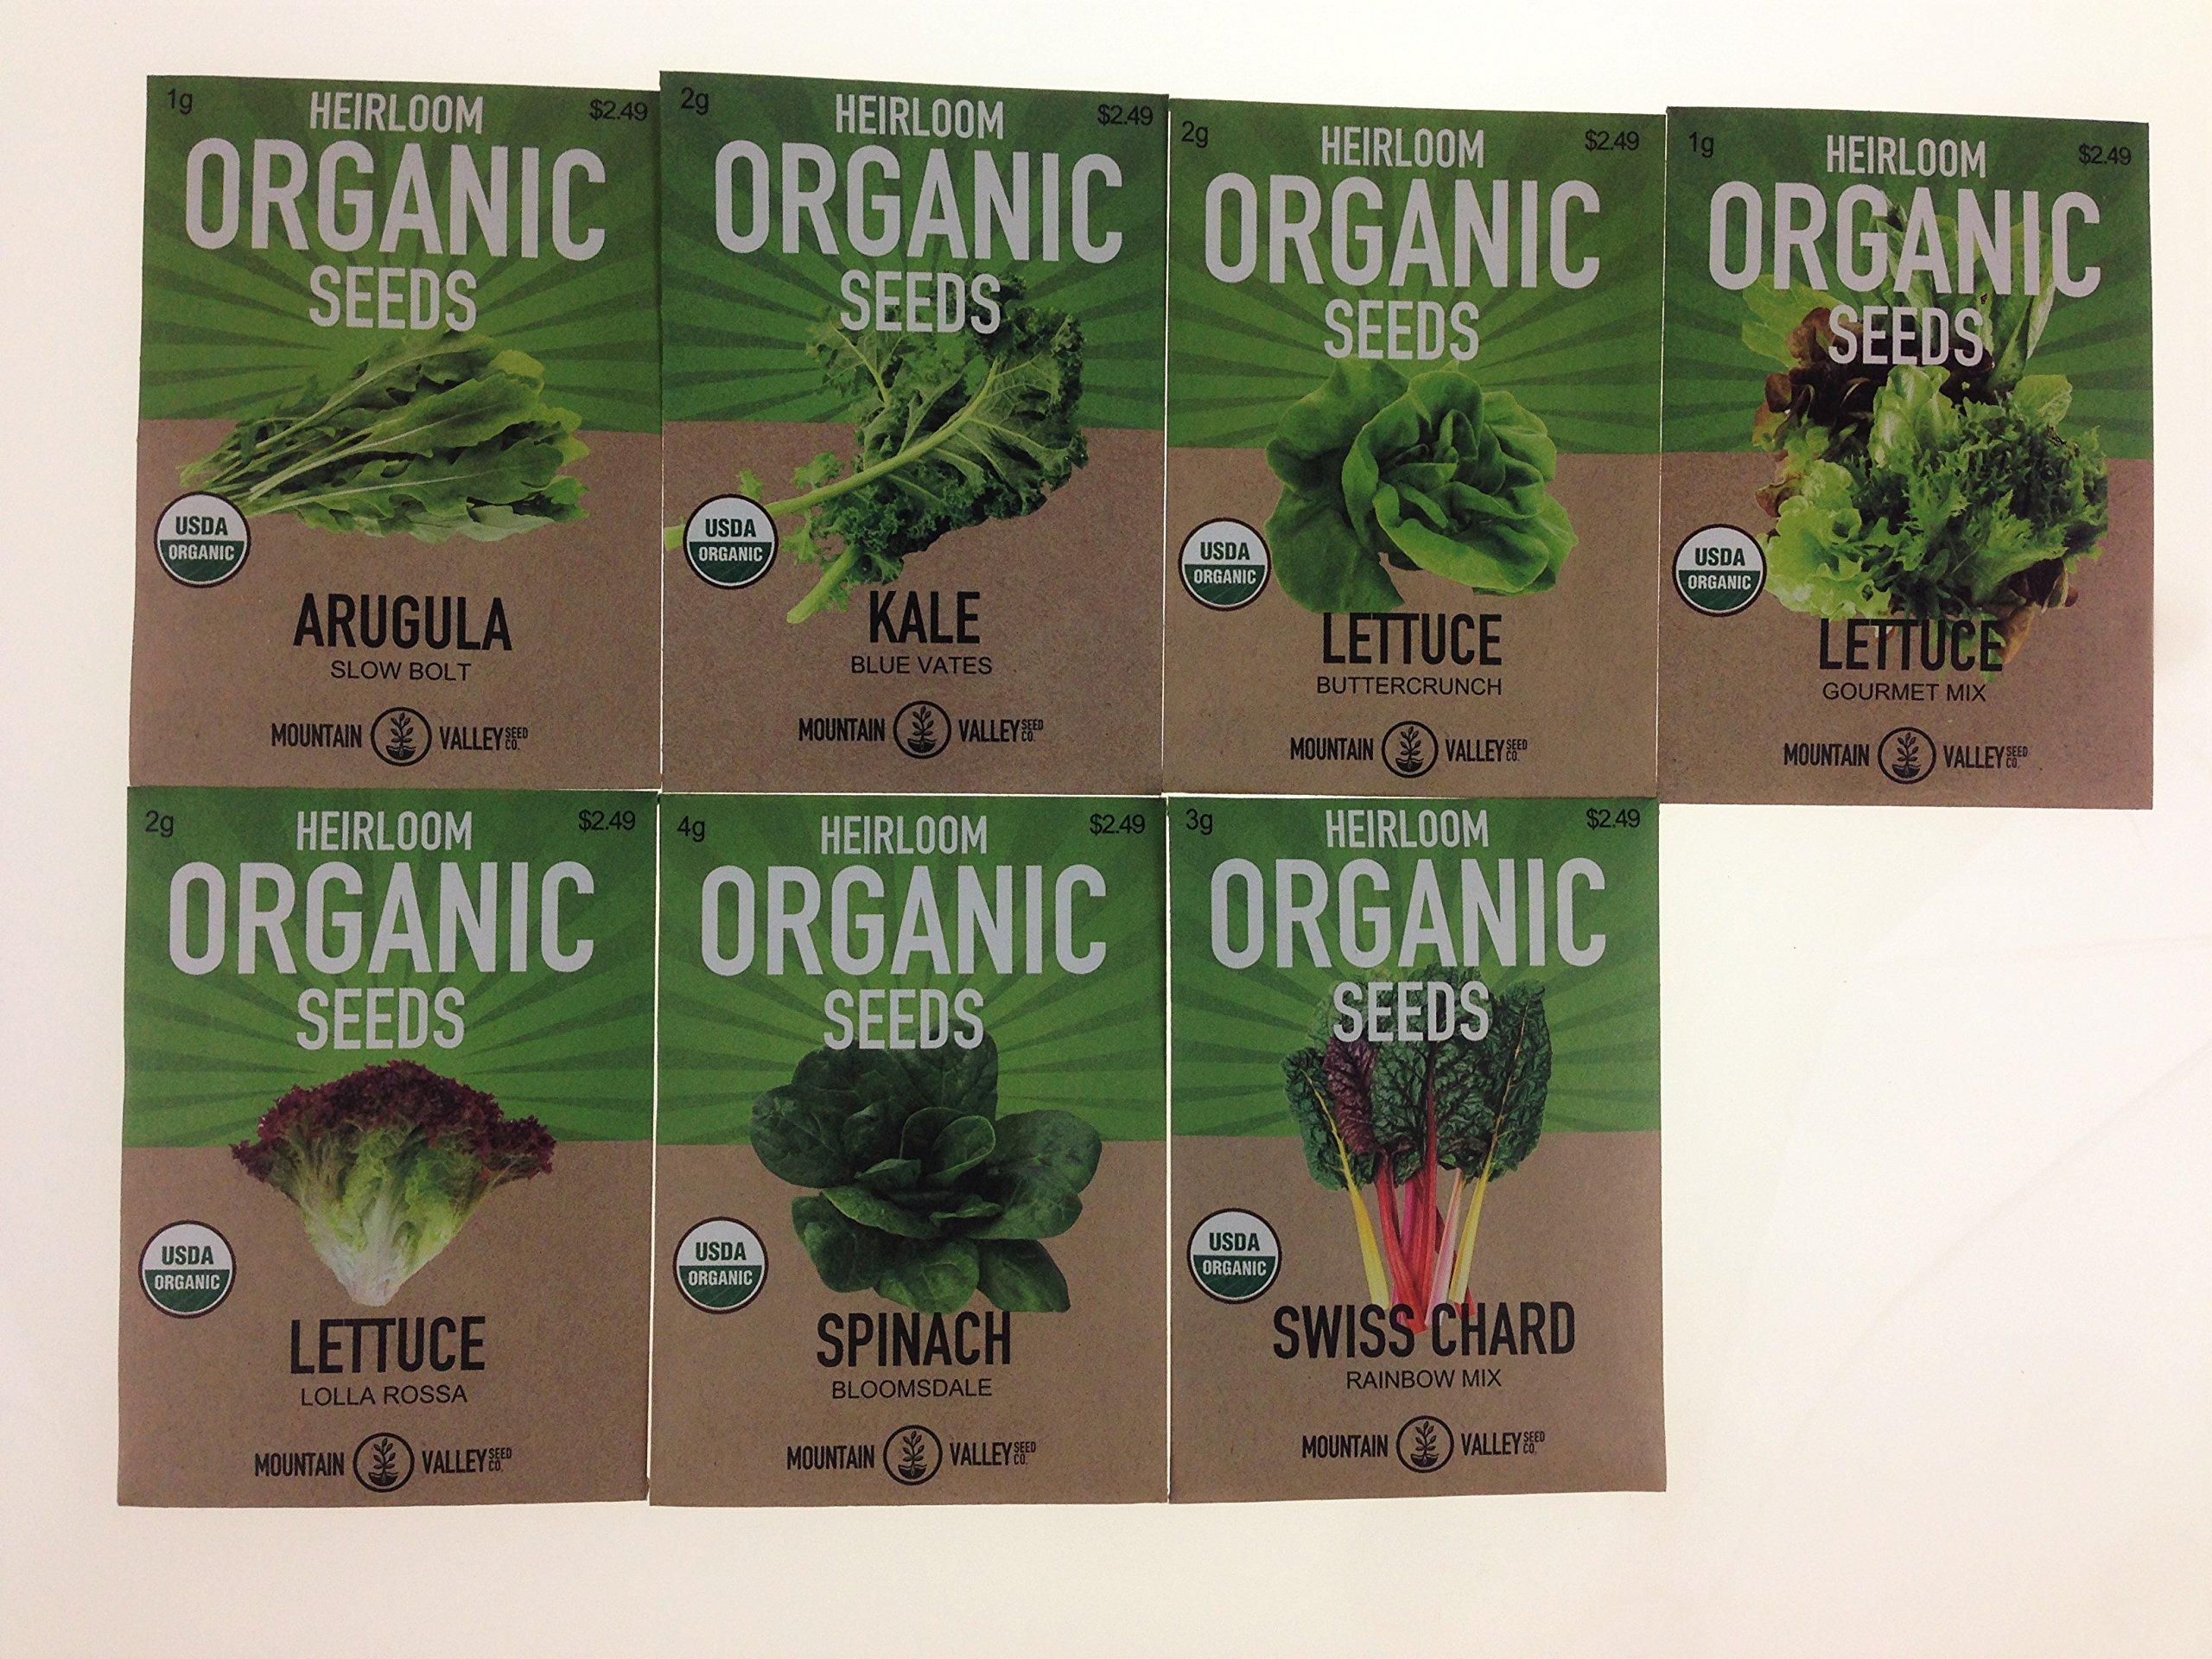 Organic, Heirloom, Non-GMO, Garden Seeds – 7 Varieties of Vegetable Leafy Power Greens – Arugula, Kale, Lolla Rossa Lettuce, Buttercrunch Lettuce, Gourmet Mix Lettuce, Spinach, Swiss Chard